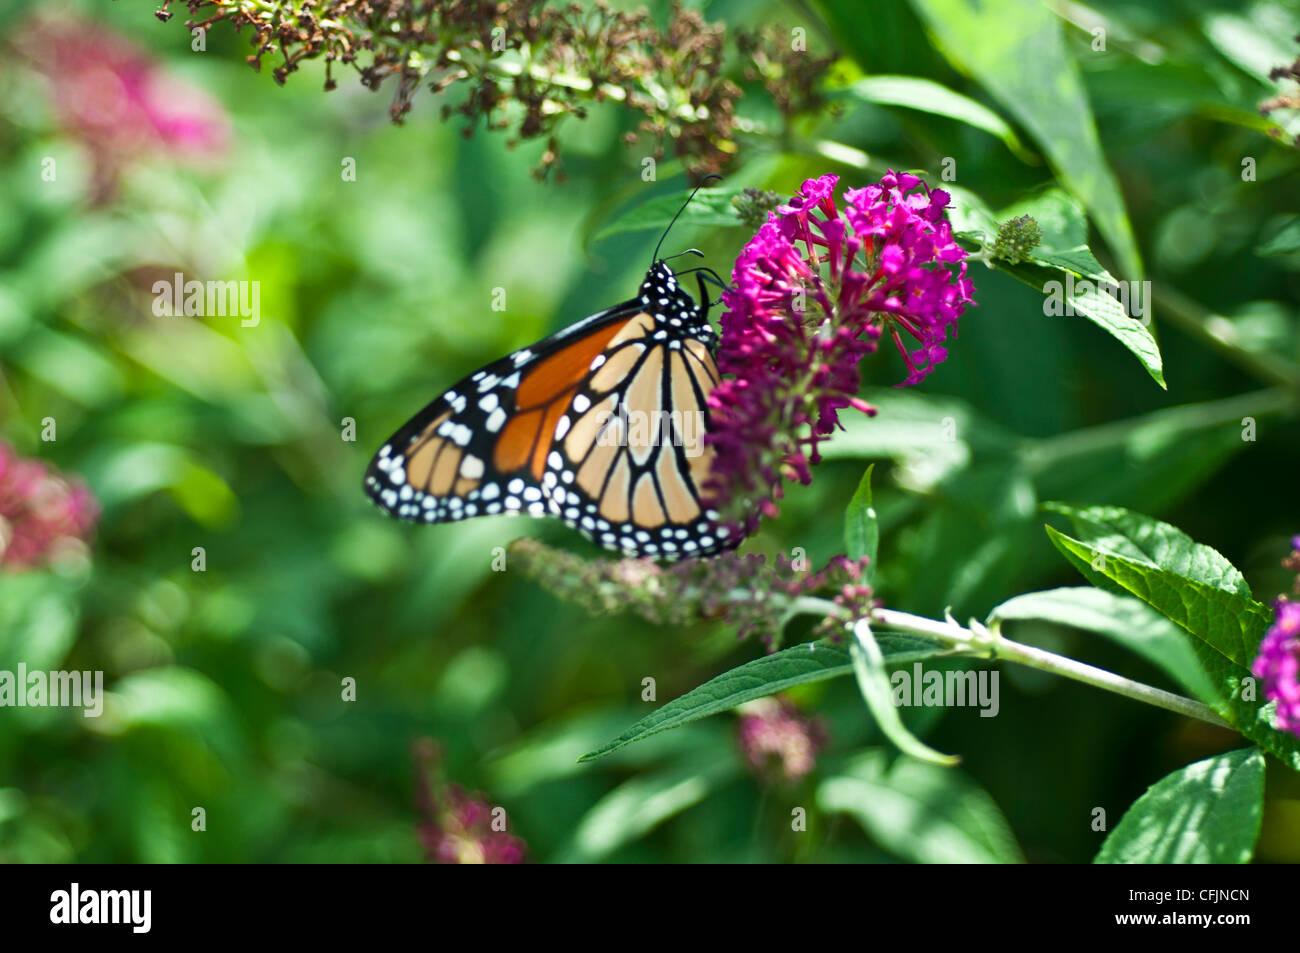 Monarch butterfly, Danaus plexippus on Purple violet flowers Butterfly Bush, Buddleja or Buddleia var Miss Ruby, - Stock Image